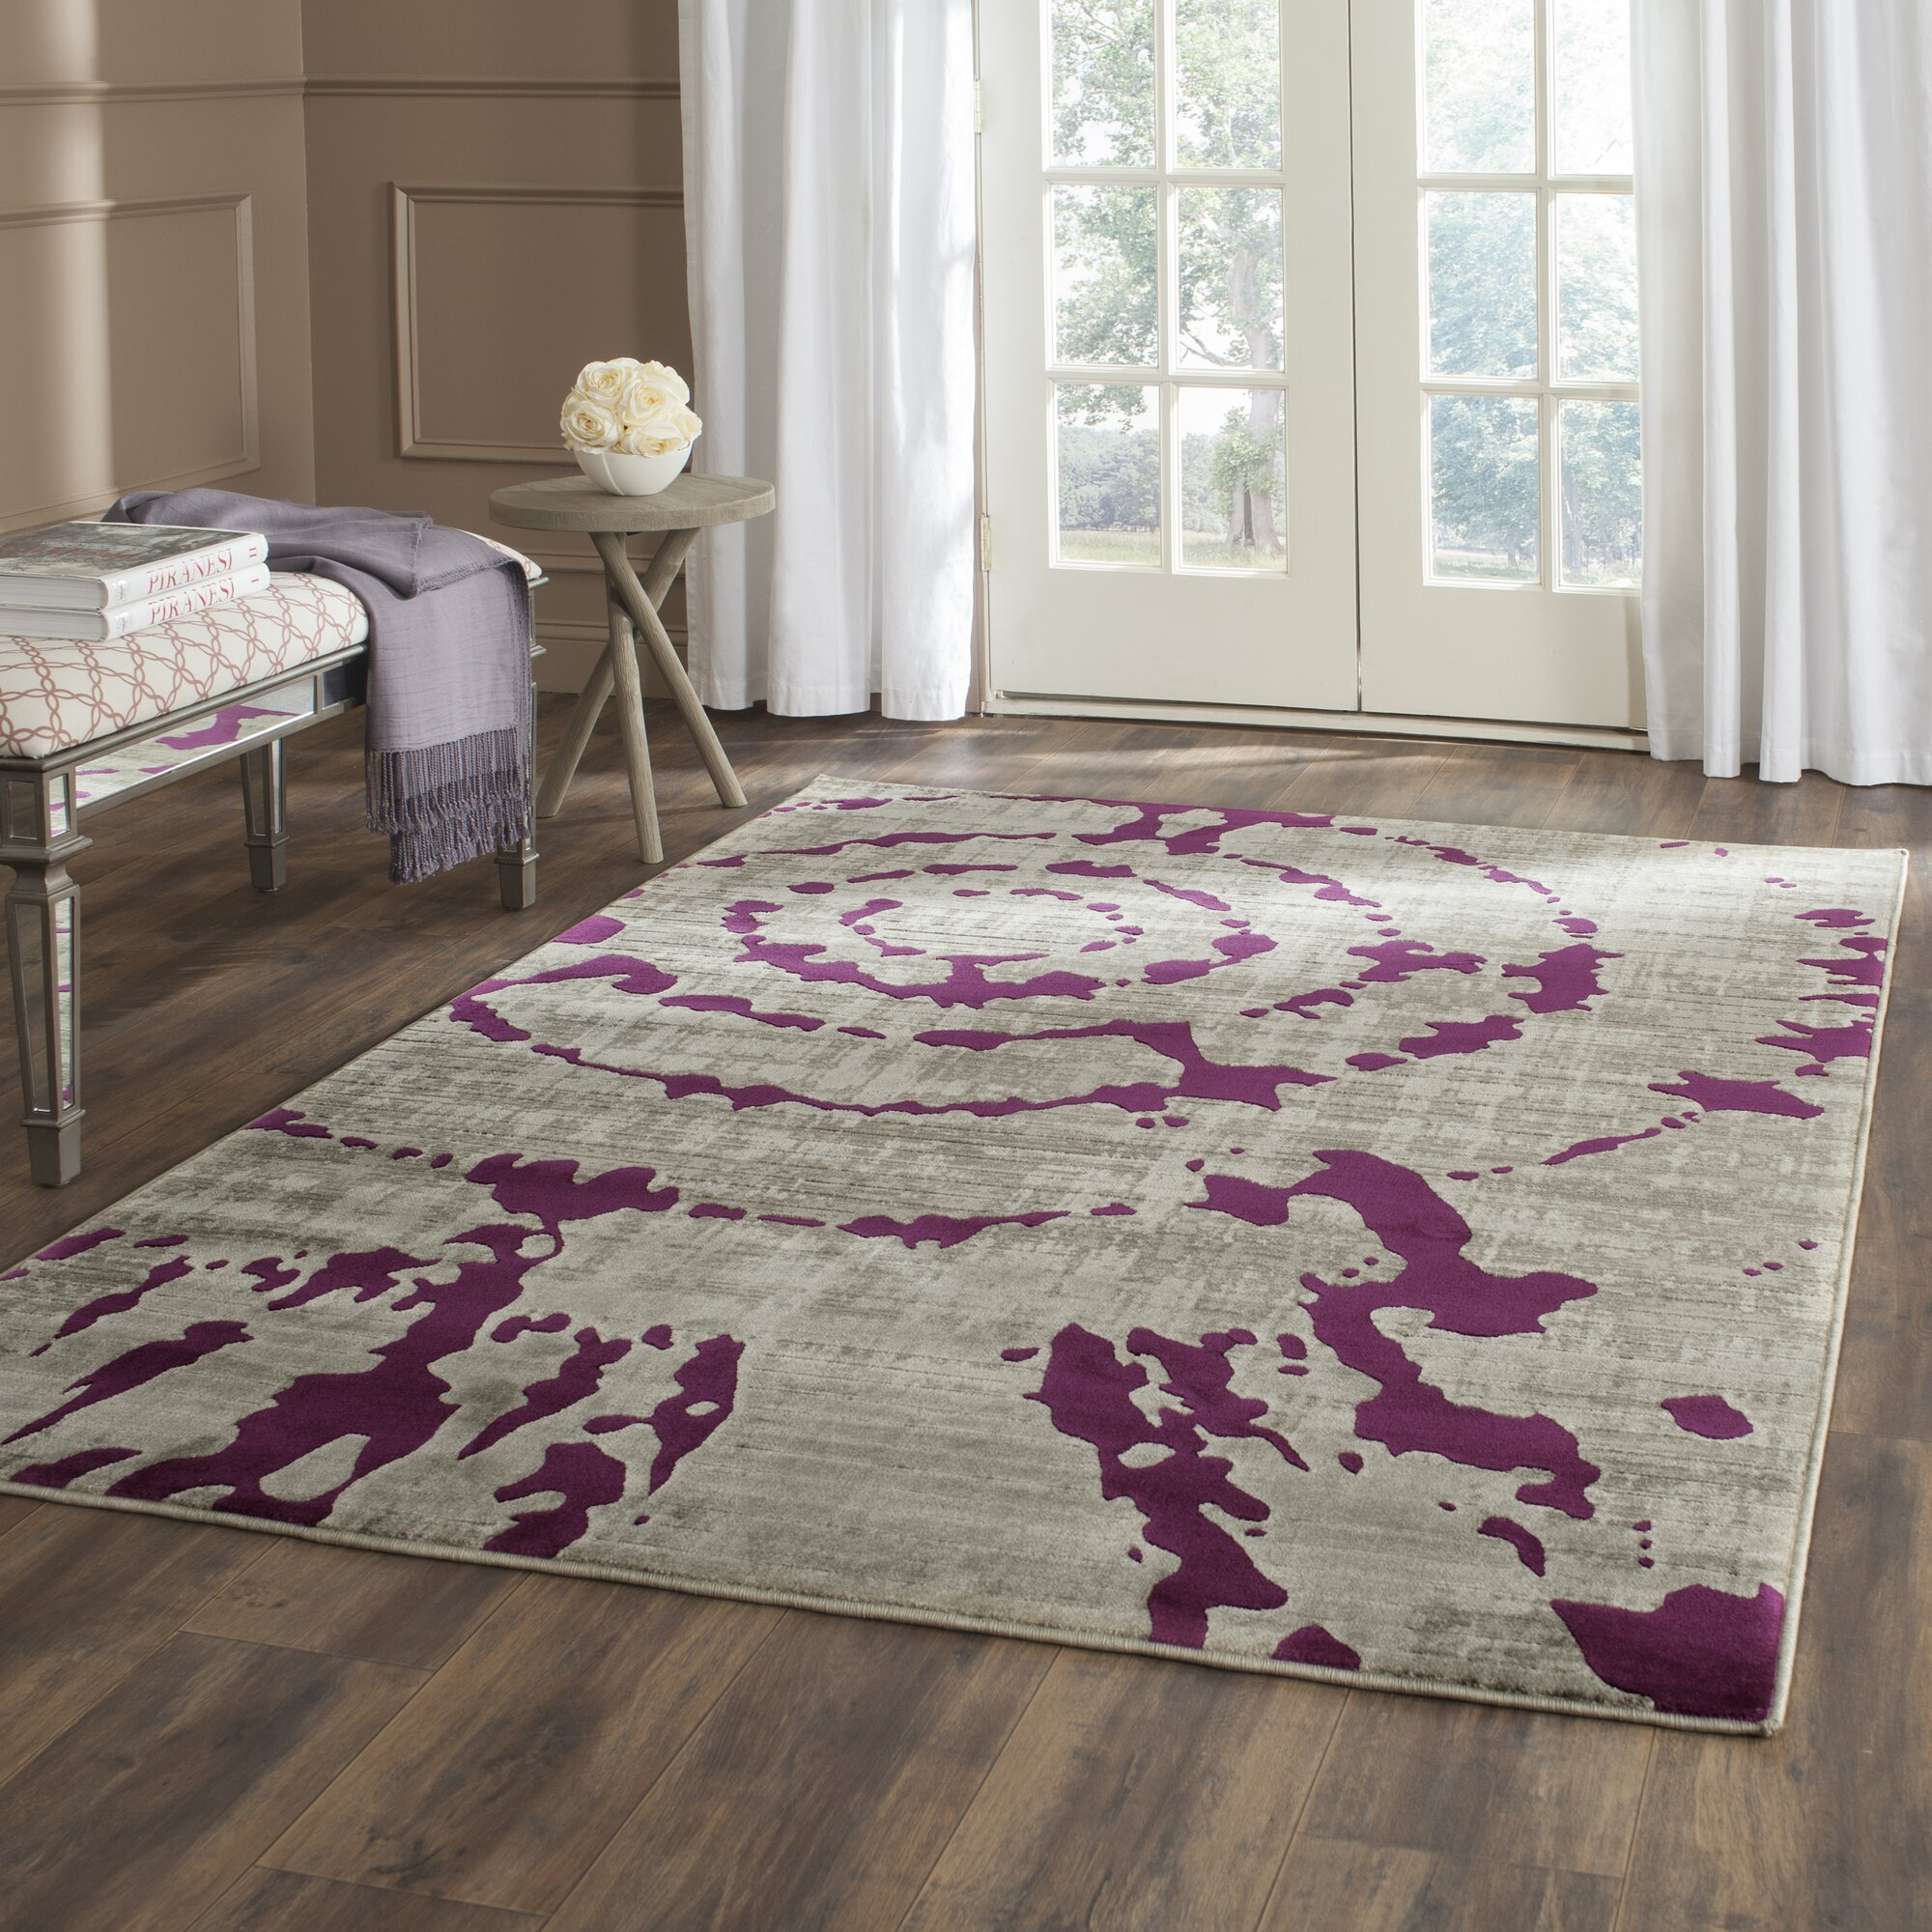 Bedroom Bedside Lamps Bedroom Colors Grey Purple Bedroom Carpet Reviews Bedroom Ideas Hotel Style: Varnai Light Gray/Purple Area Rug & Reviews